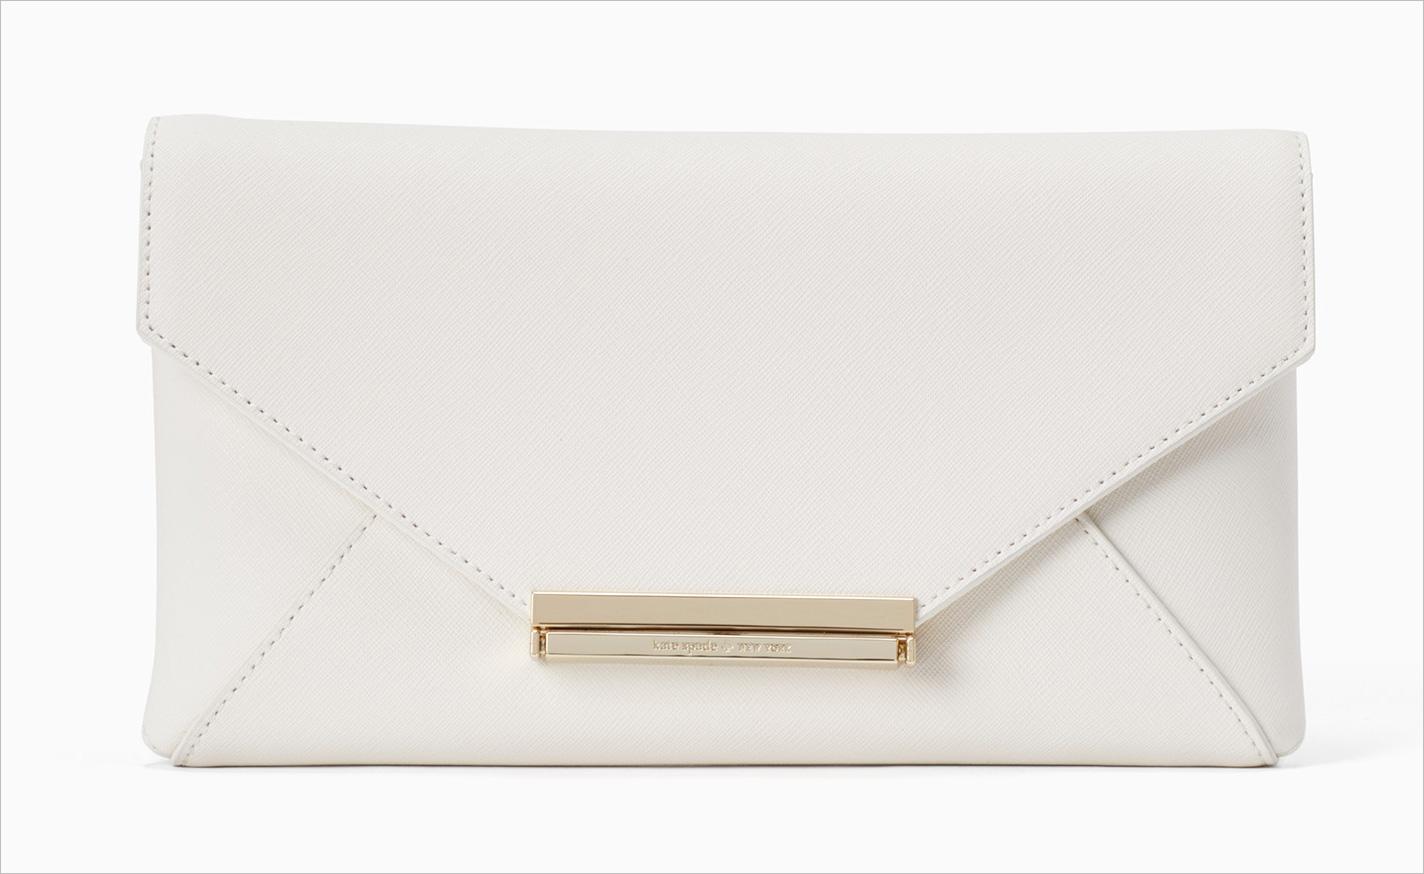 Wedding belles charla envelope clutch white kate spade bridal clutch ideas weddings